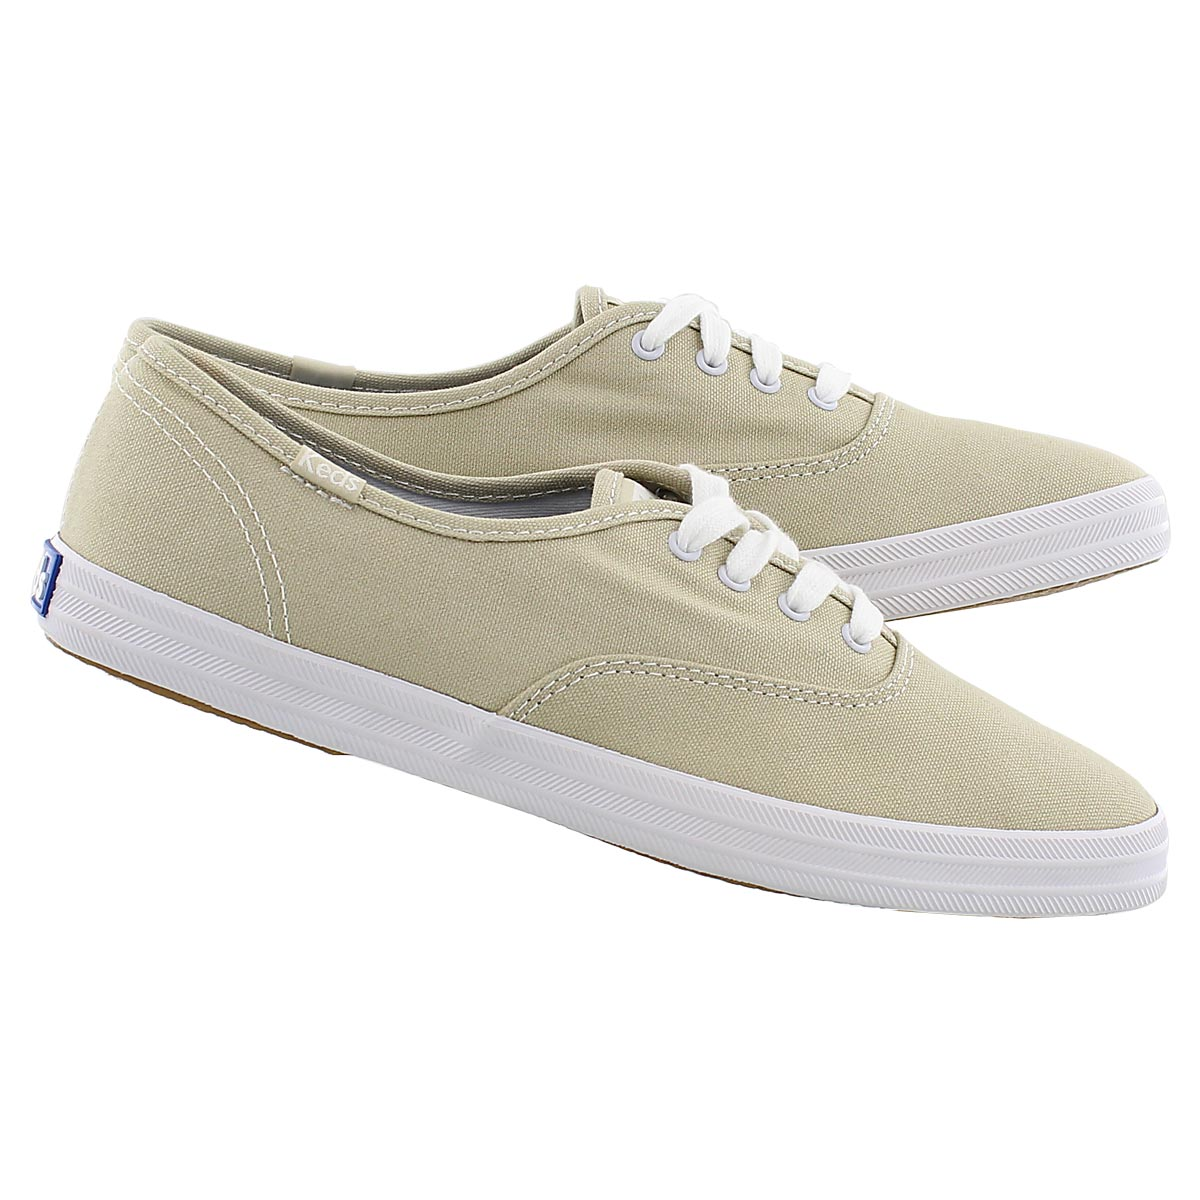 Lds Champion stone canvas CVO sneaker